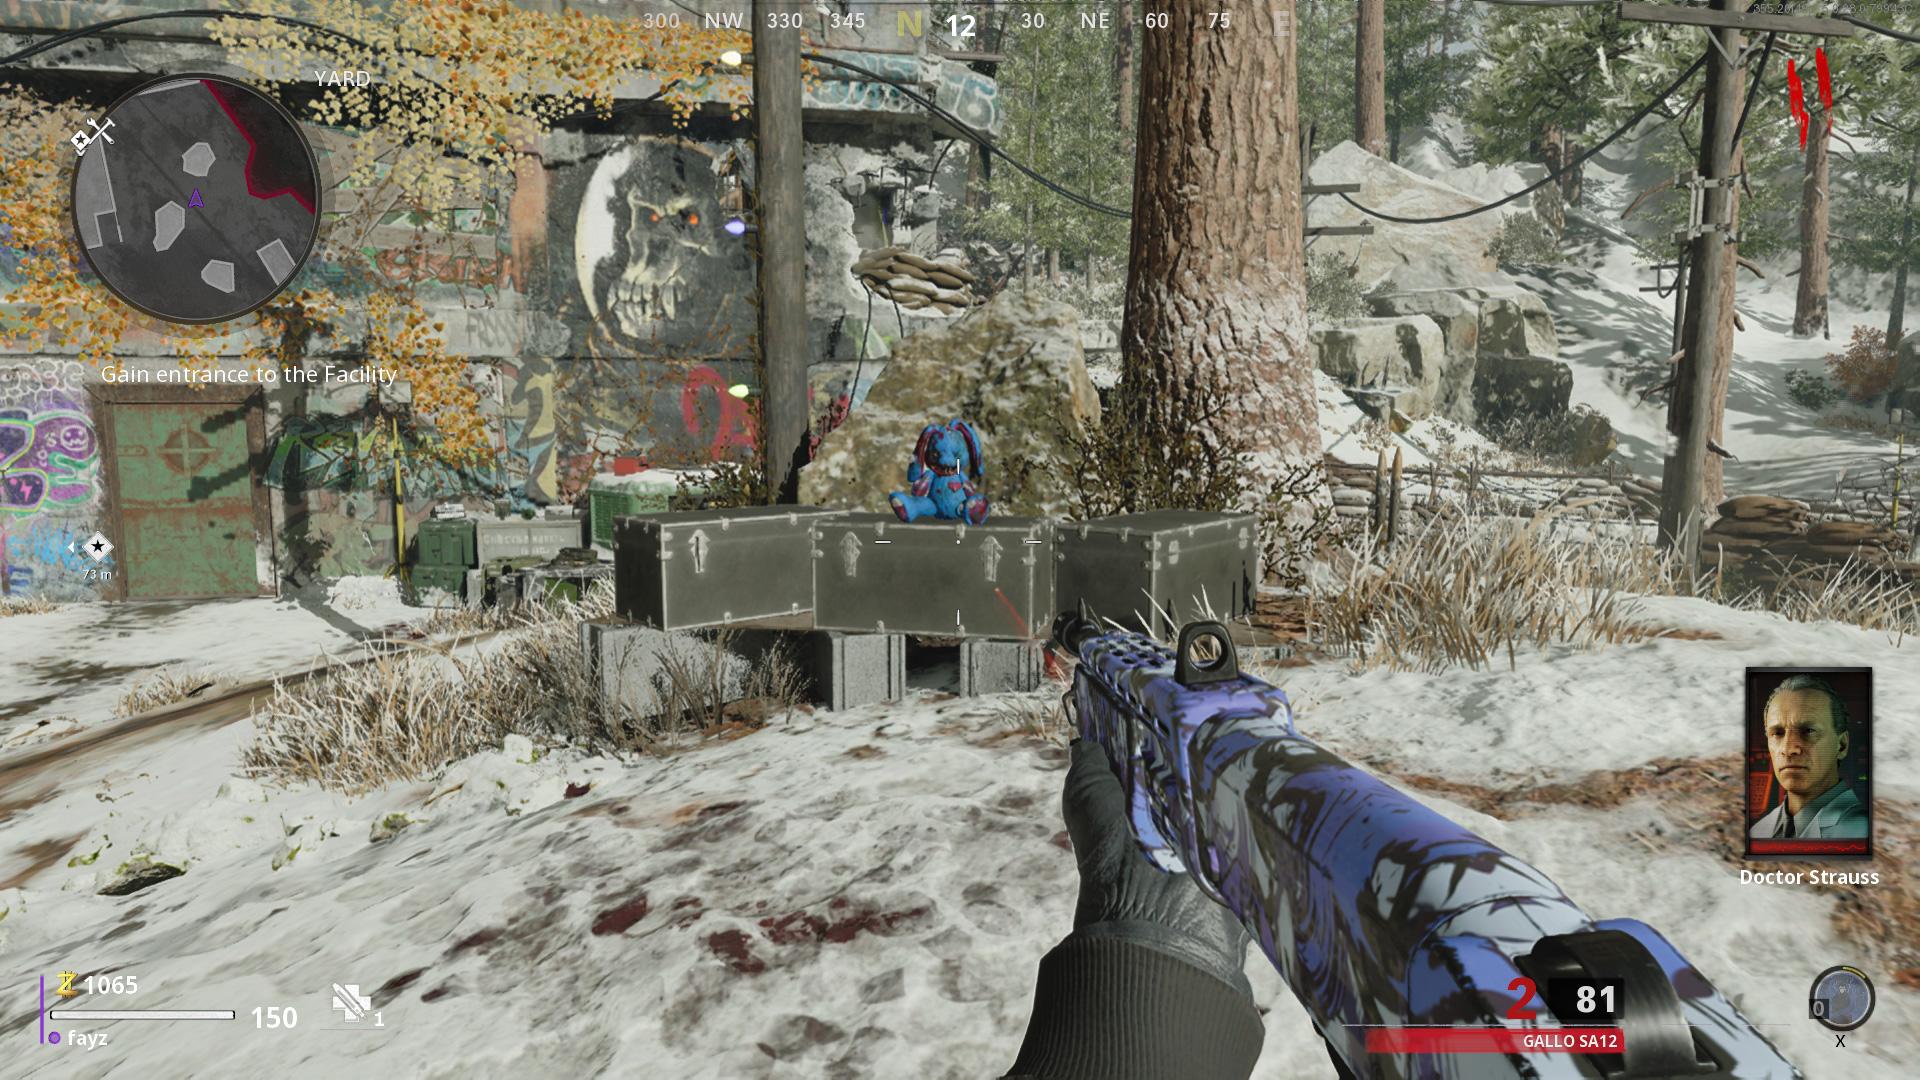 Call of Duty: Emplacements des boîtes mystères dans Black Ops Cold War Zombies - Yard